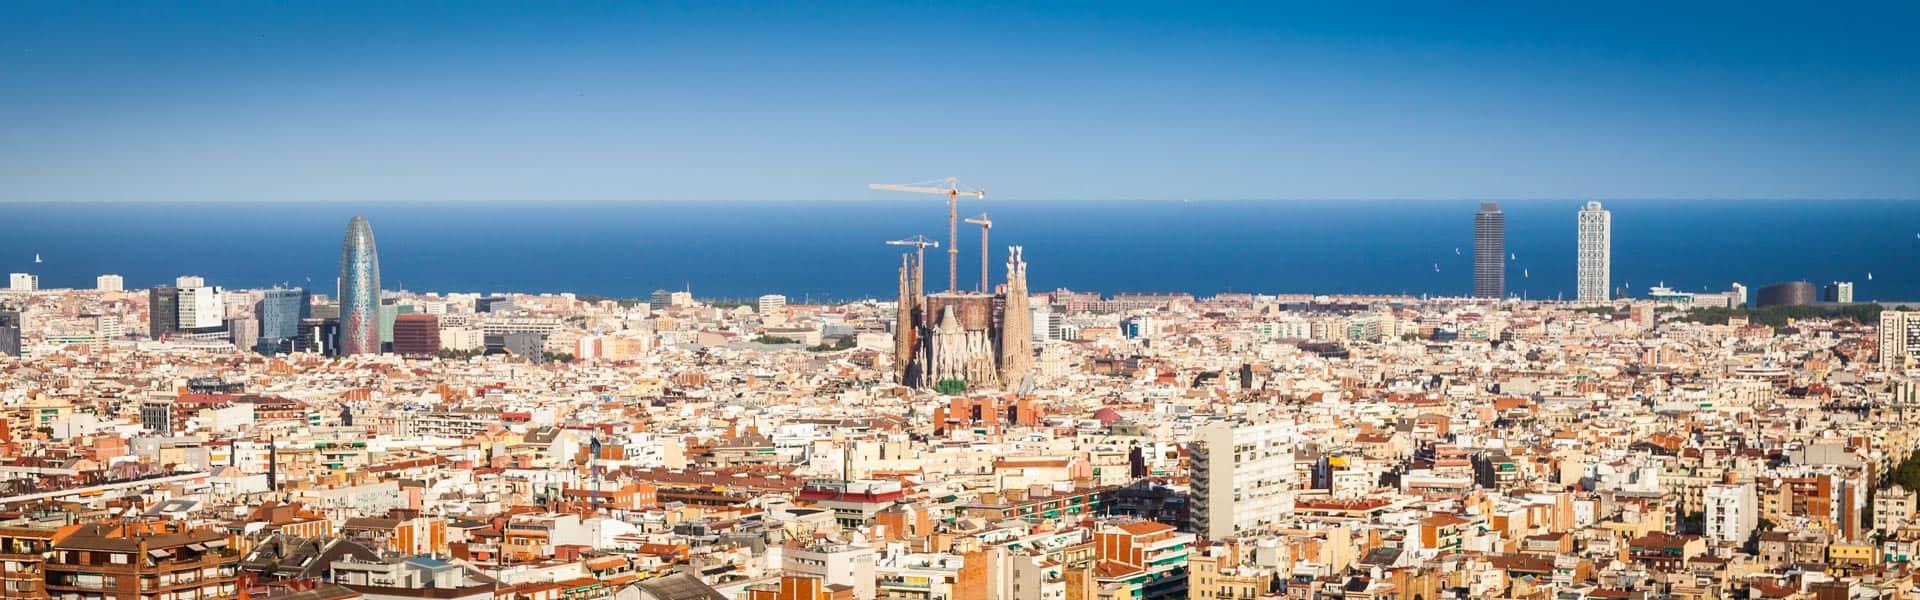 Heilige Stätte: die Sagrada Familia in Barcelona